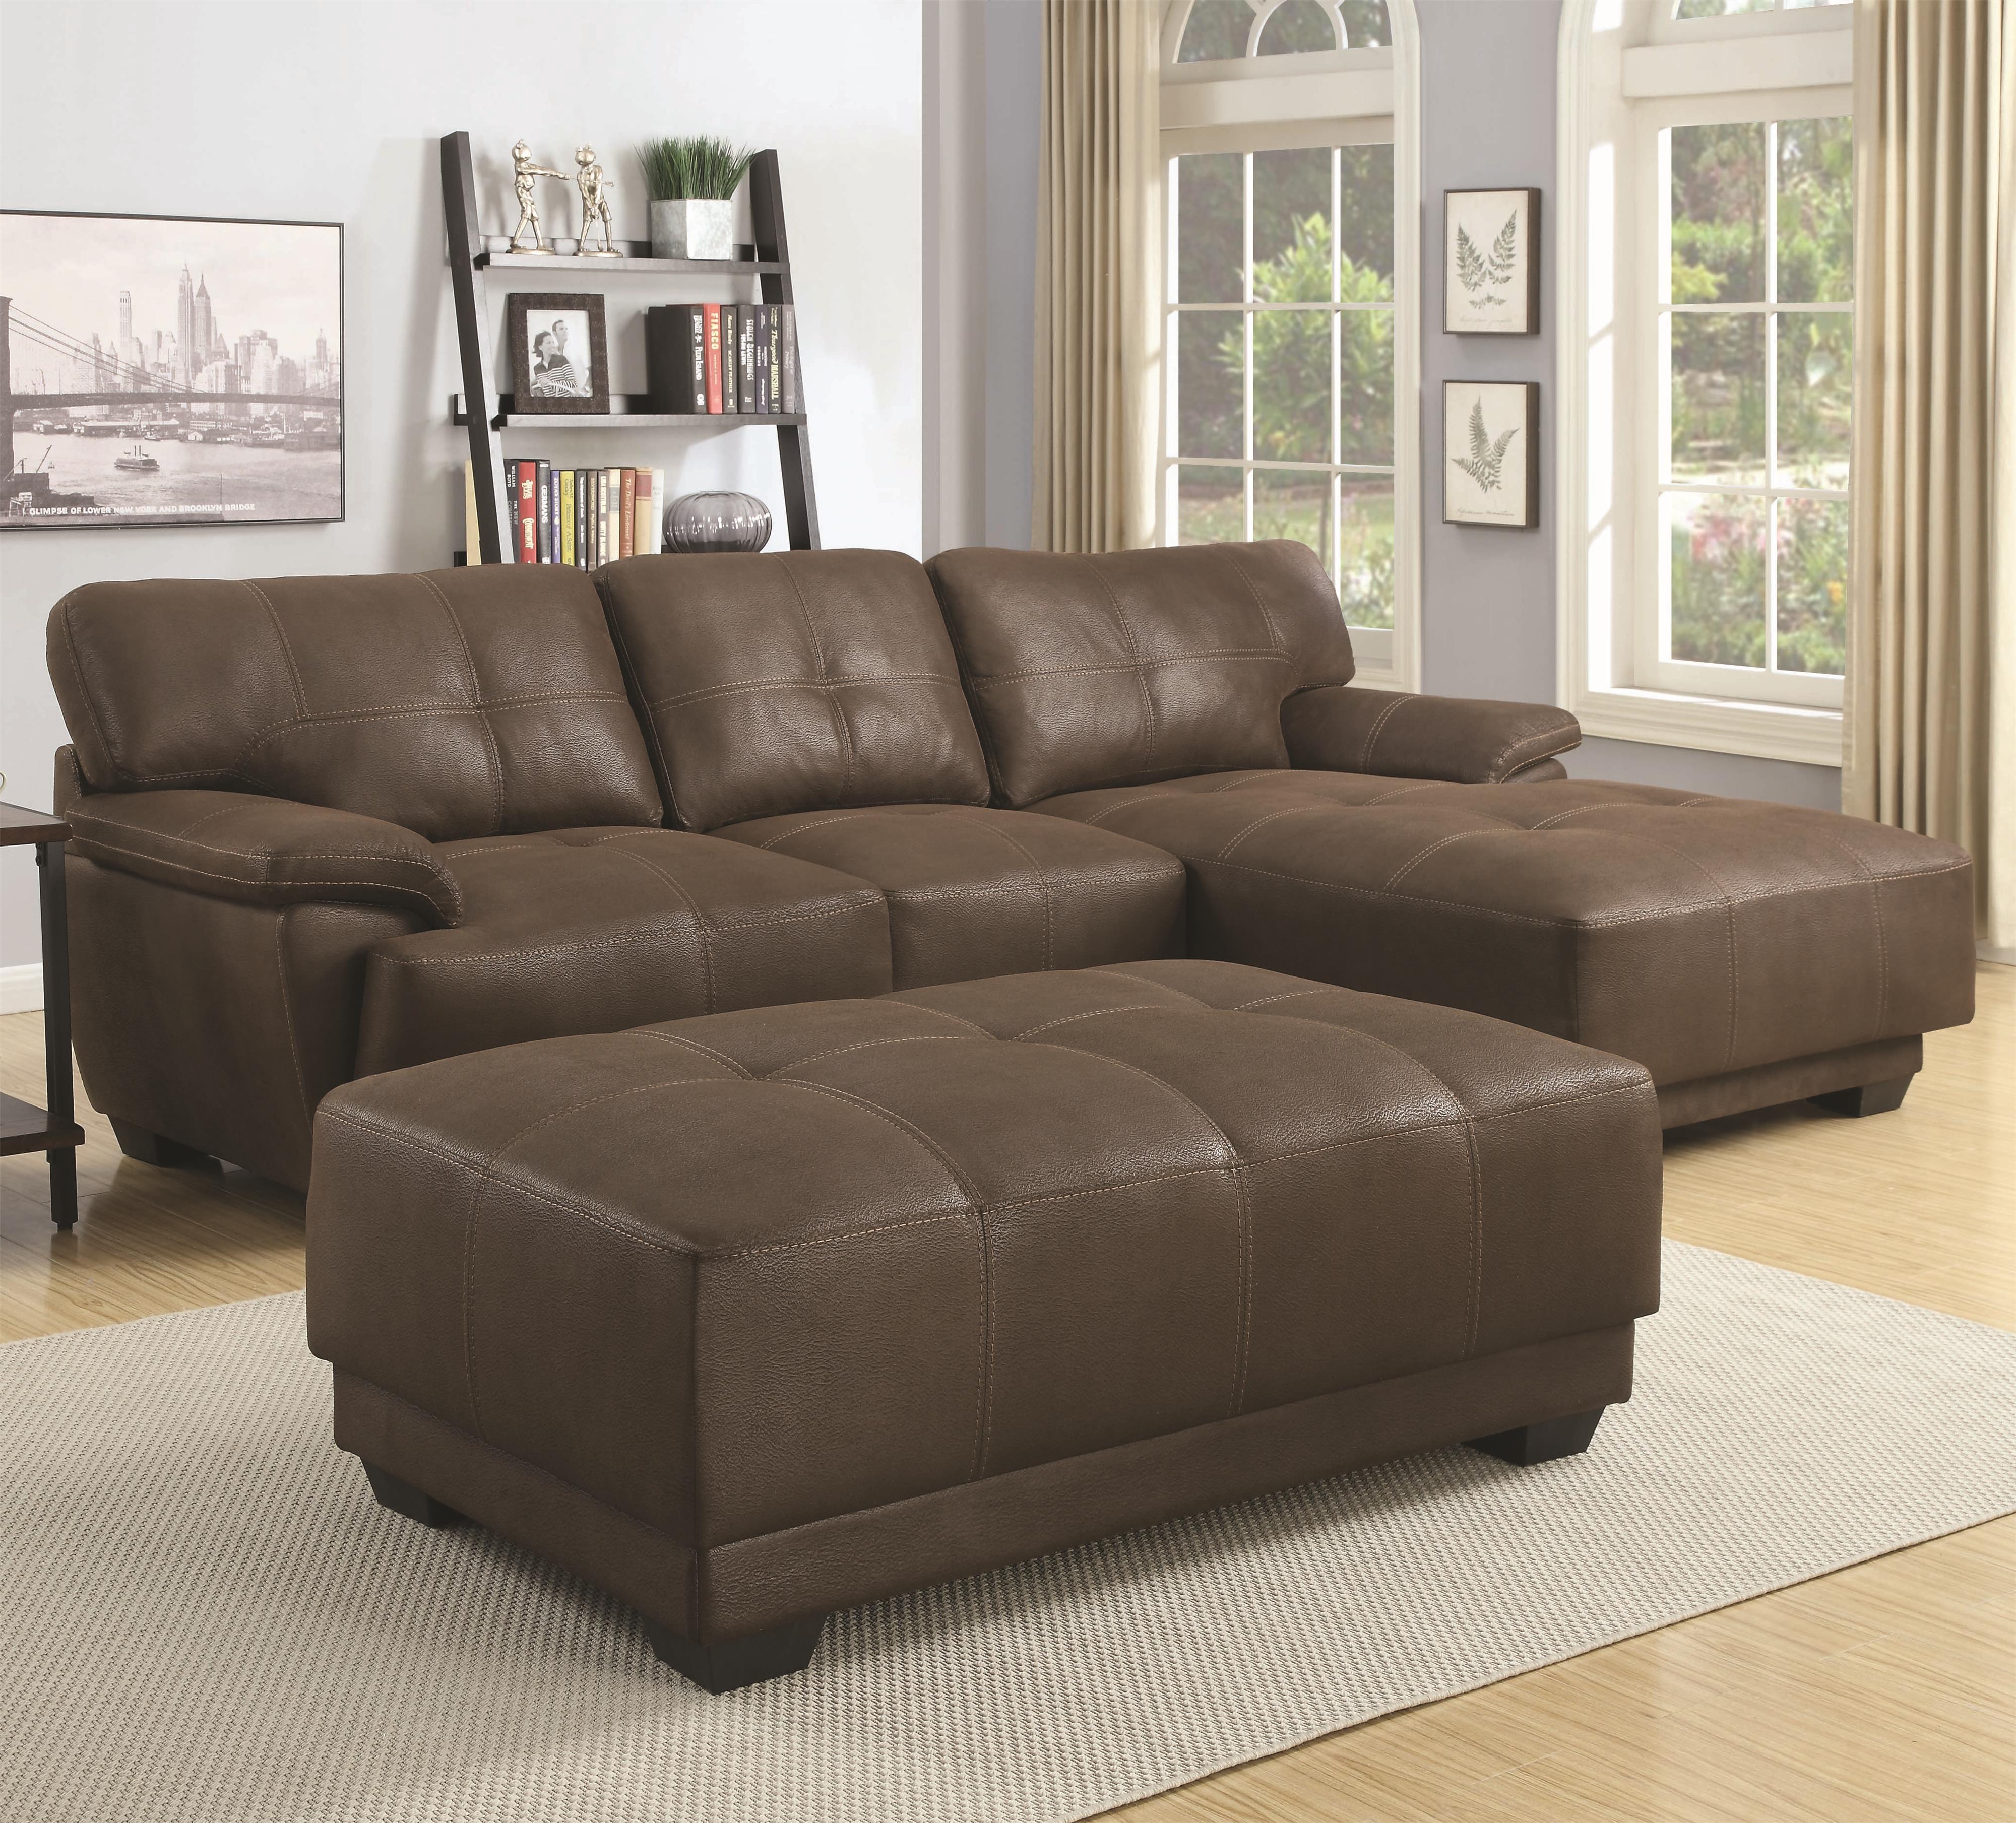 Coaster Murik Living Room Group - Item Number: Living Room Group